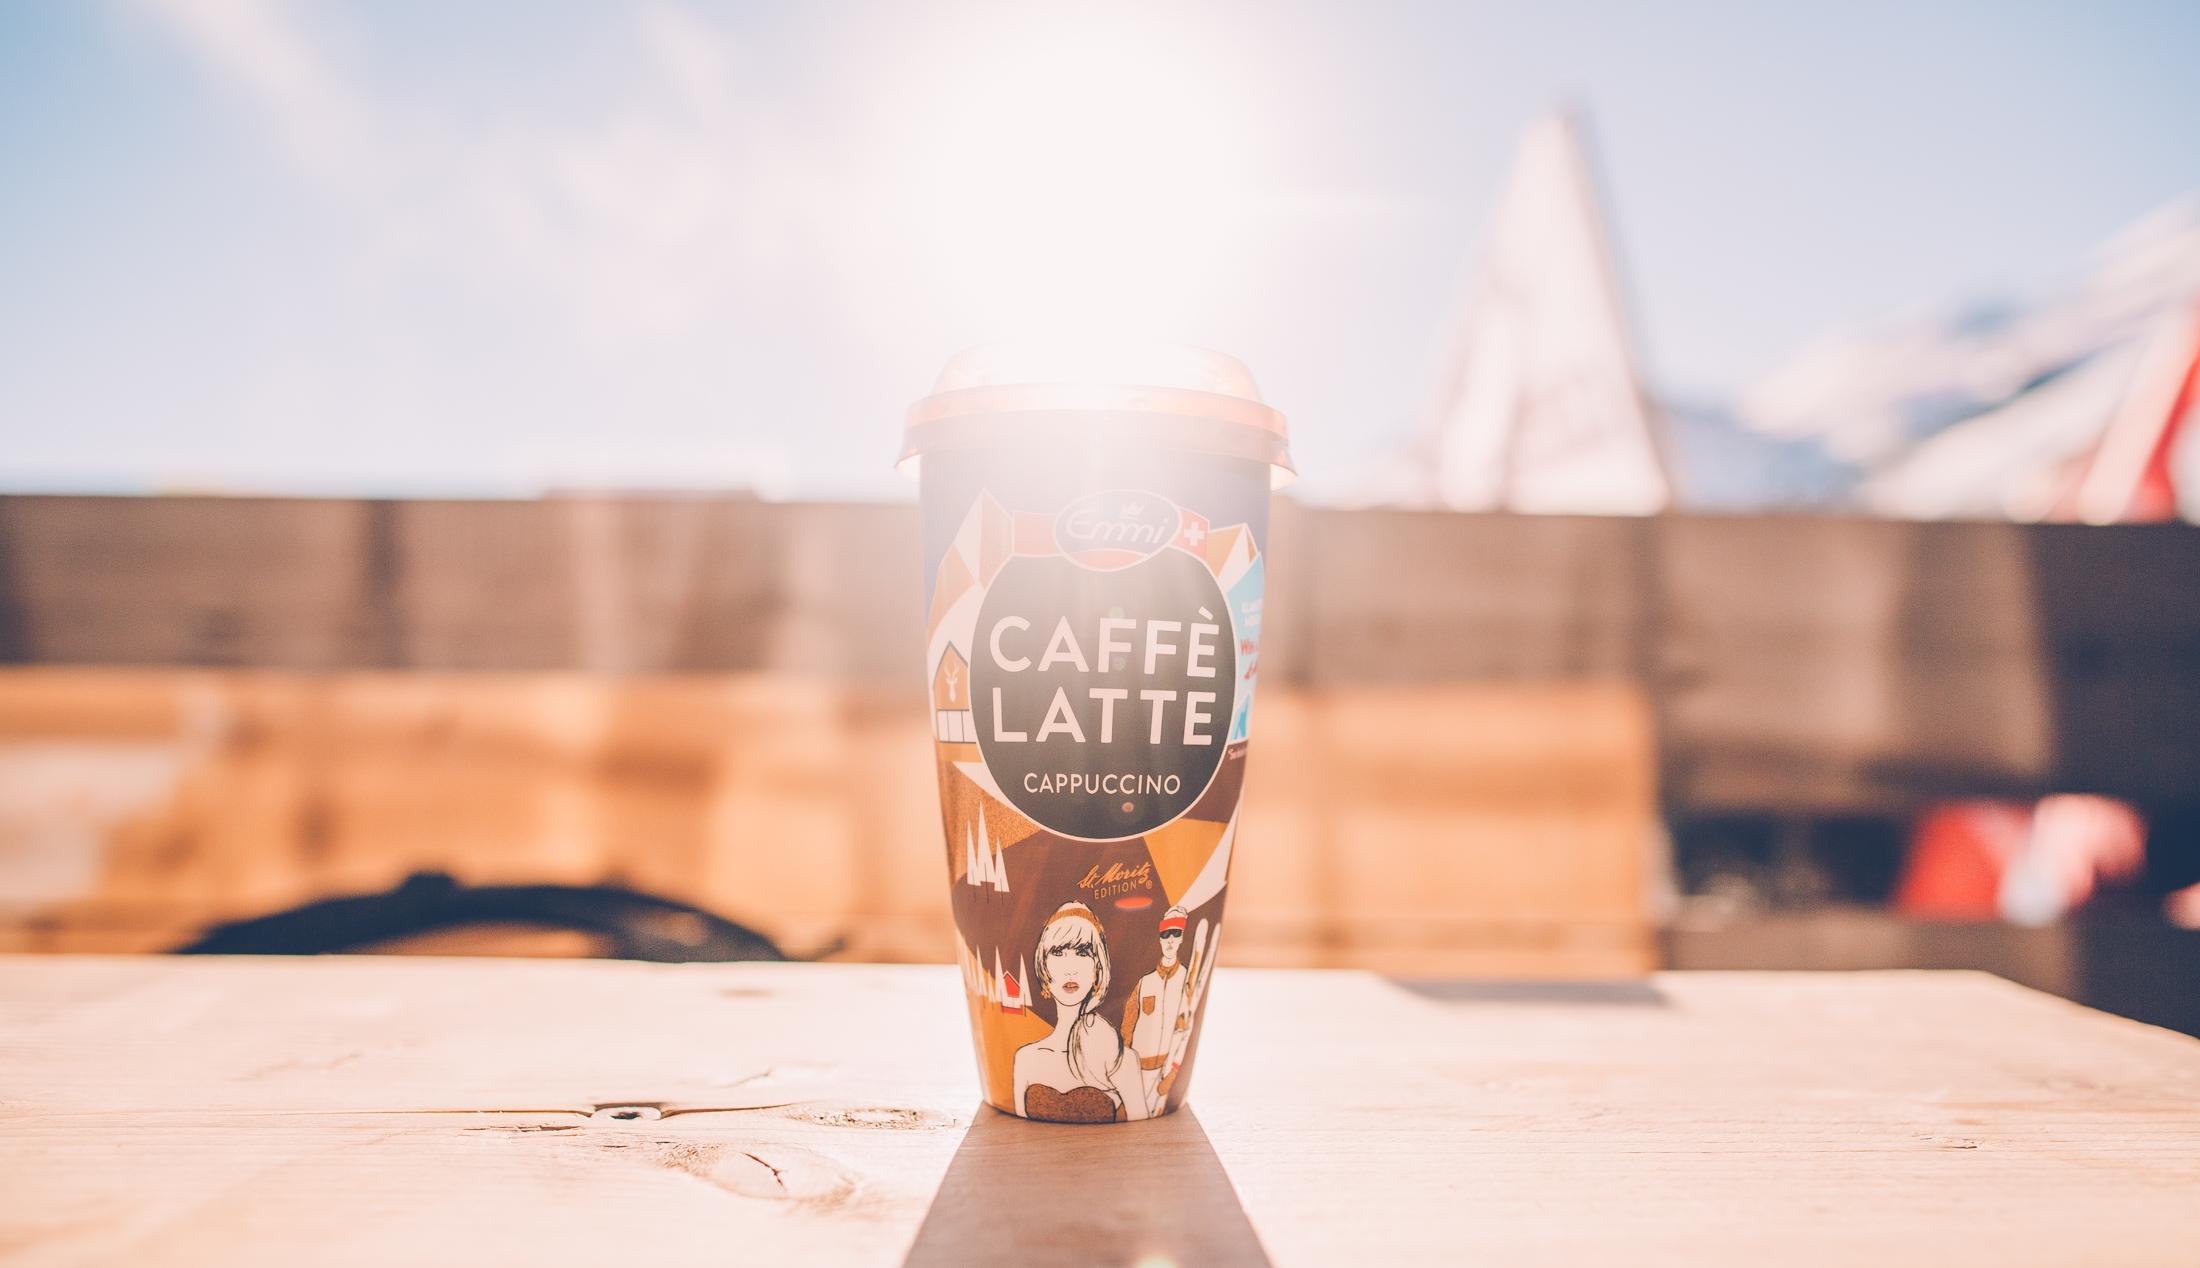 Emmi-Image Caffe Latte.jpg